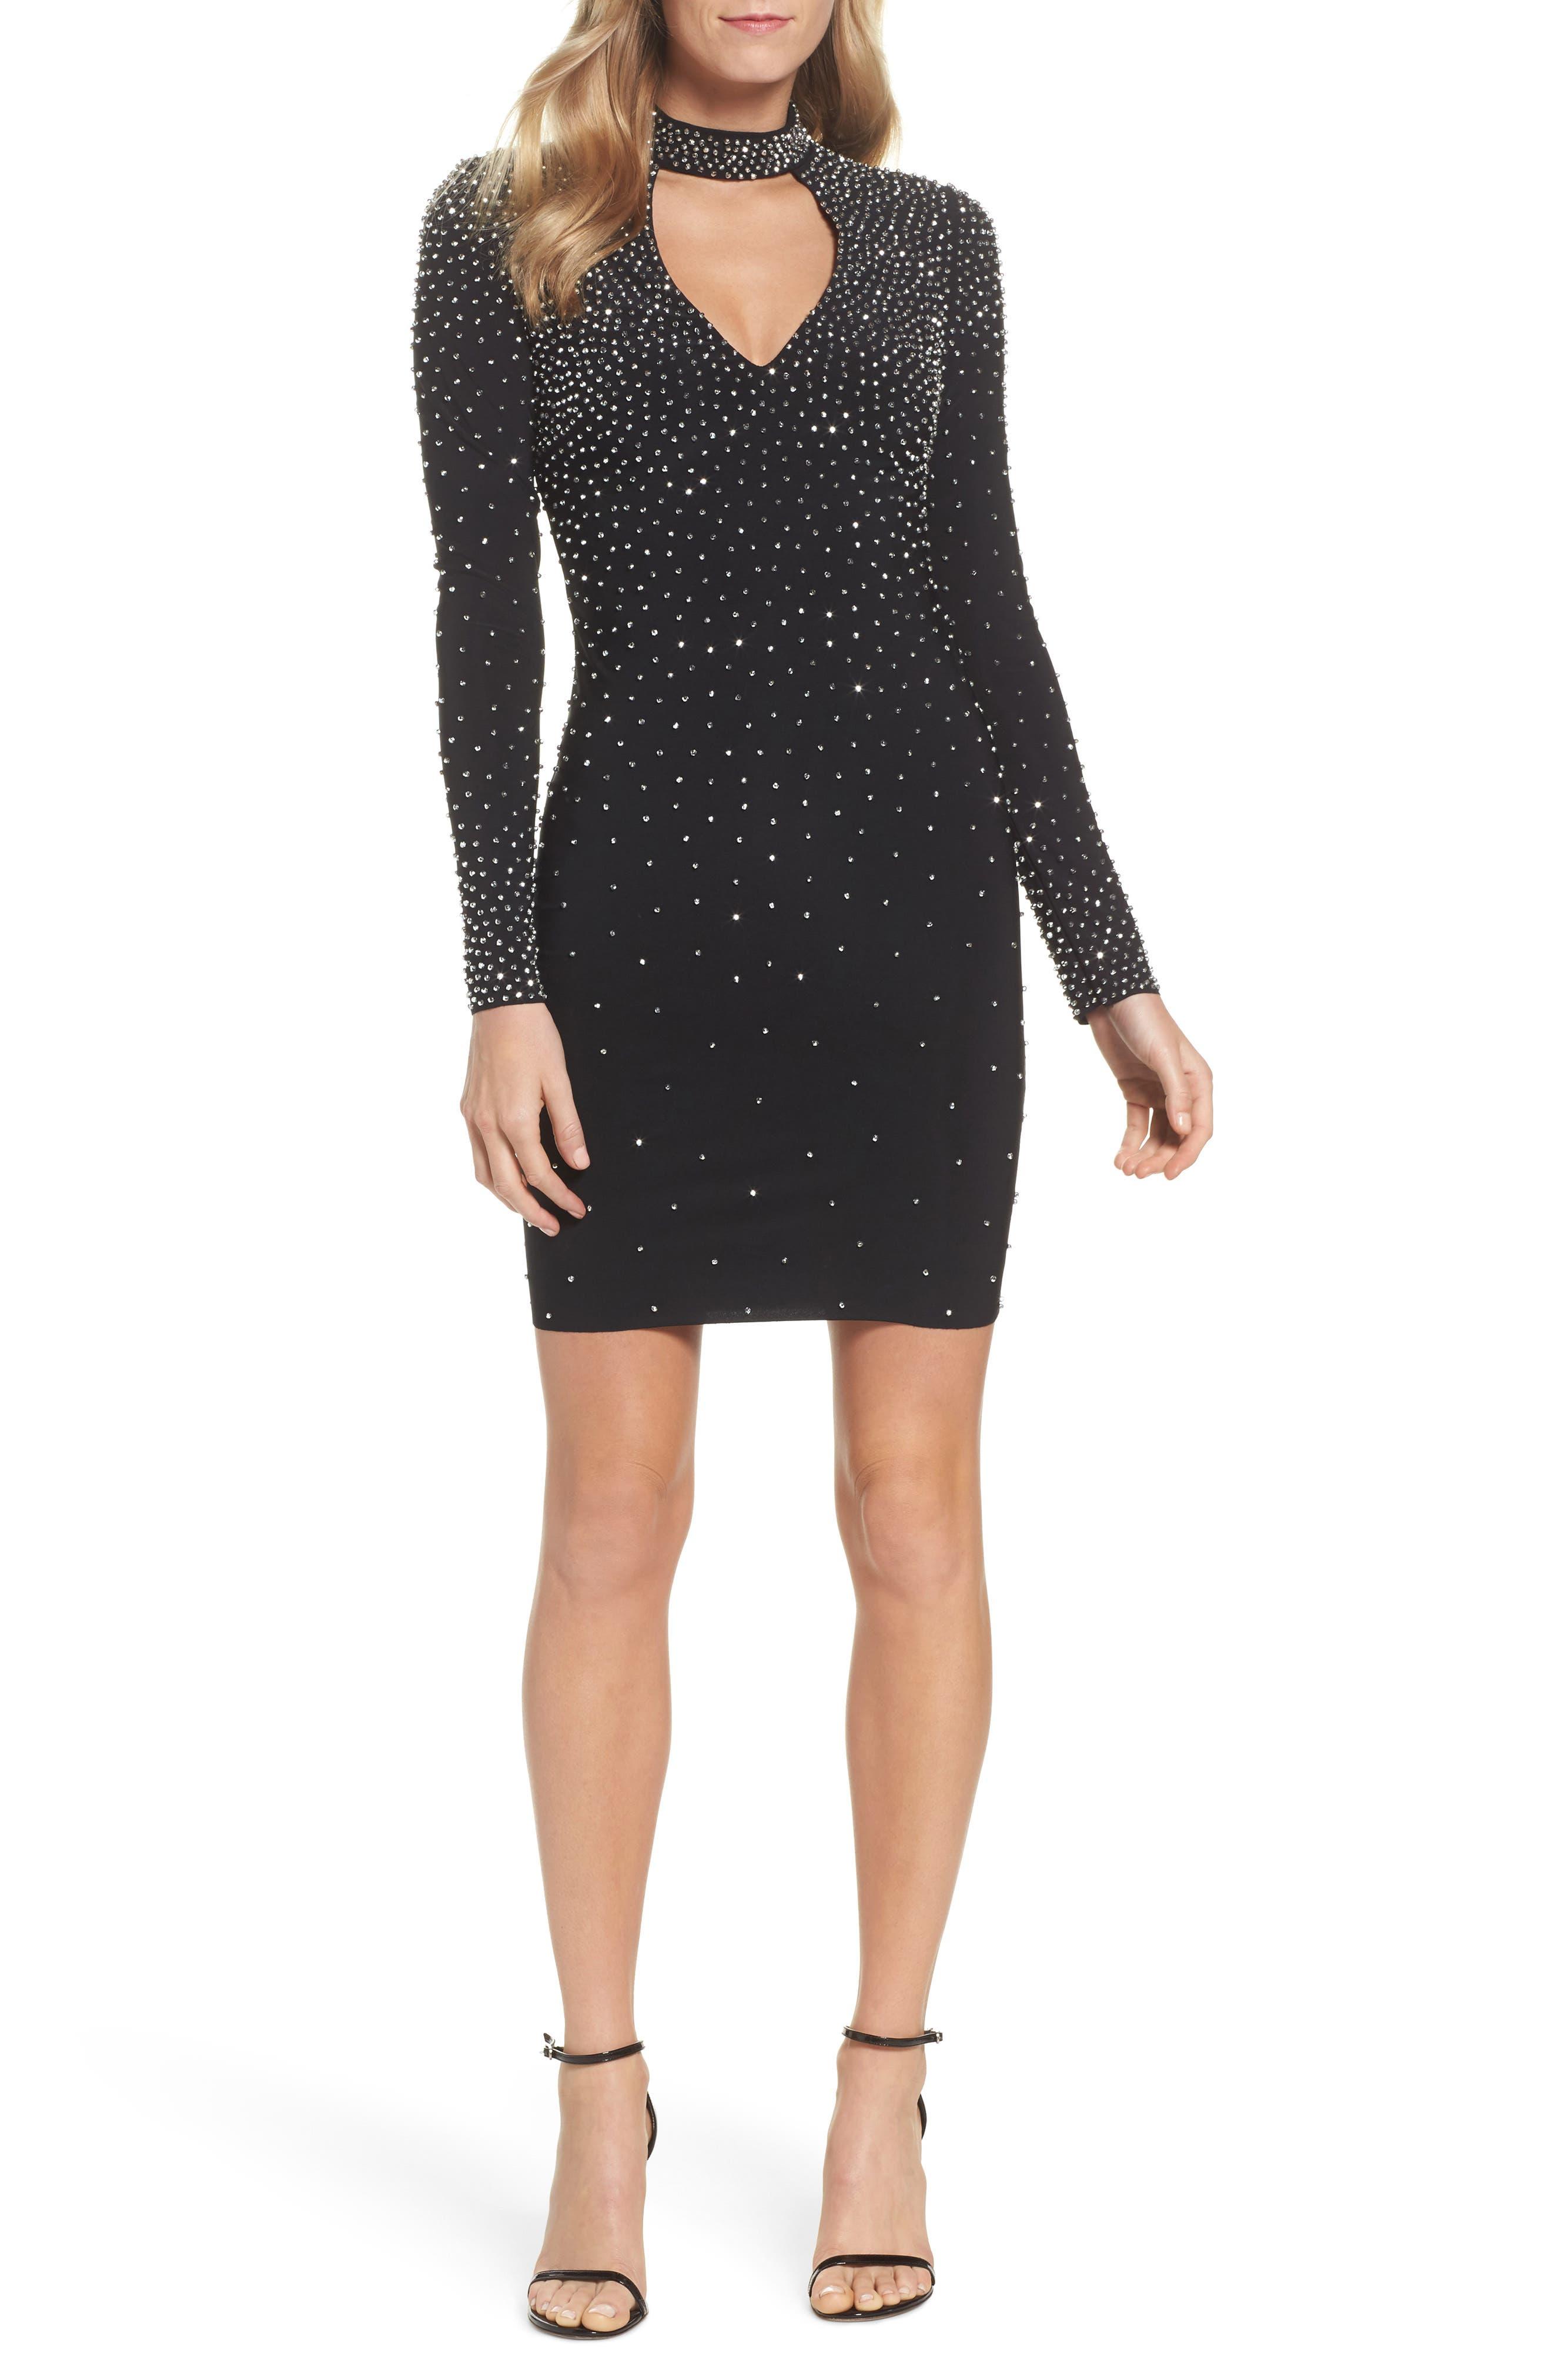 Xscape Embellished Choker Neck Body-Con Dress